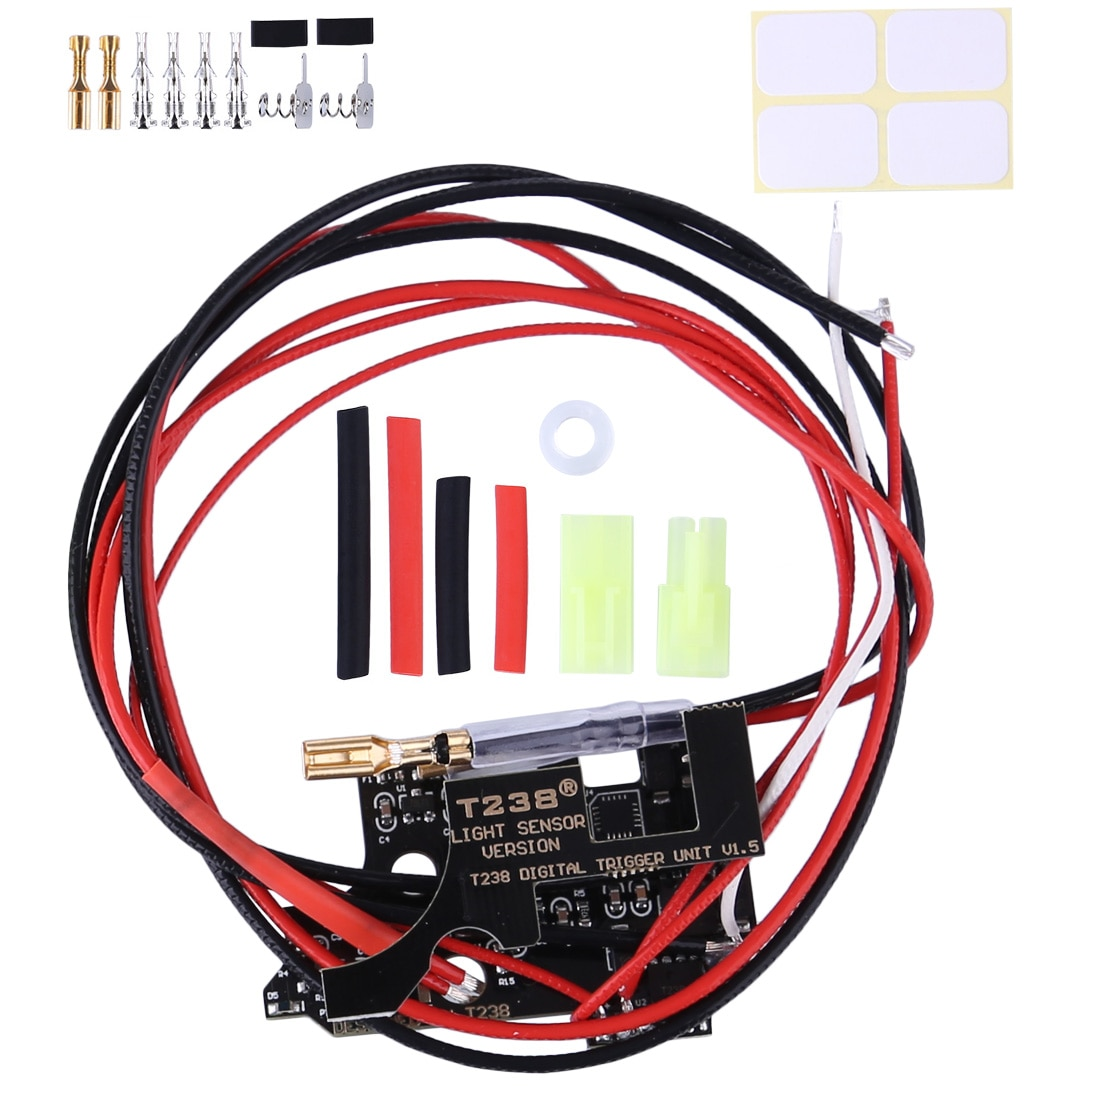 Version 1.7 T238 Programmable MOSFET Electronic Fire Control Module for XWE M4 / JM Gen.9 / FB / Kublai / Jingji/JQ No.2 Gearbox